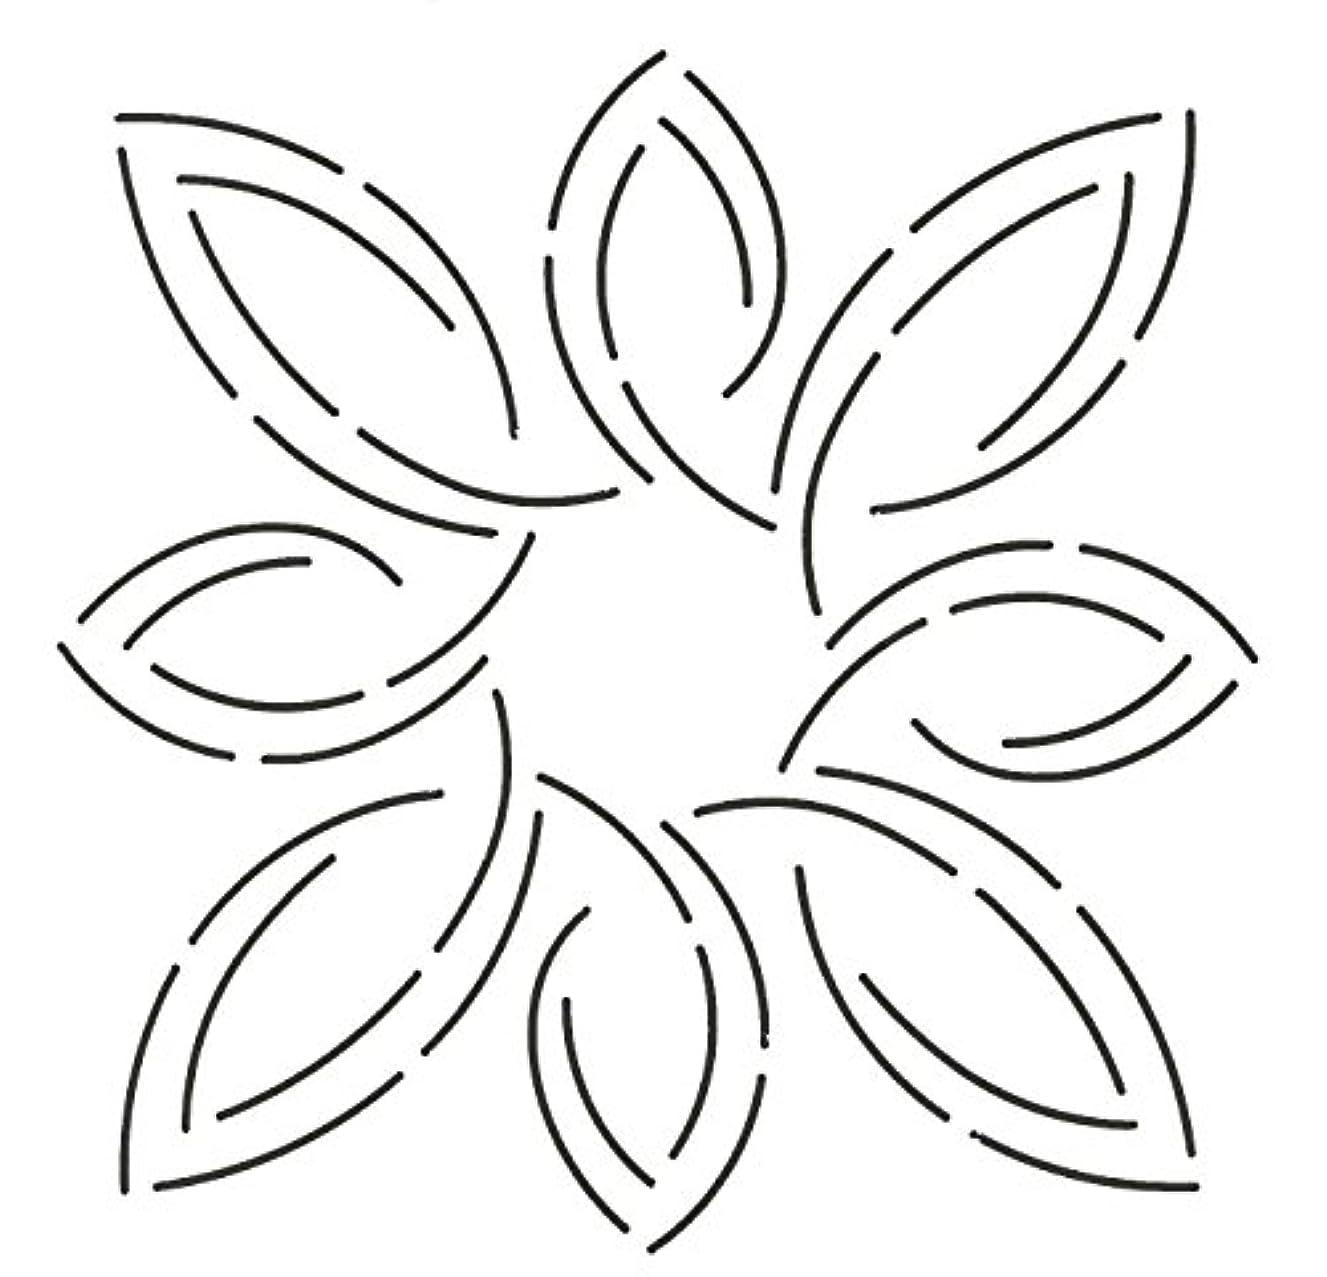 Quilting Creations Pear Leaf Medallion Stencil, 7